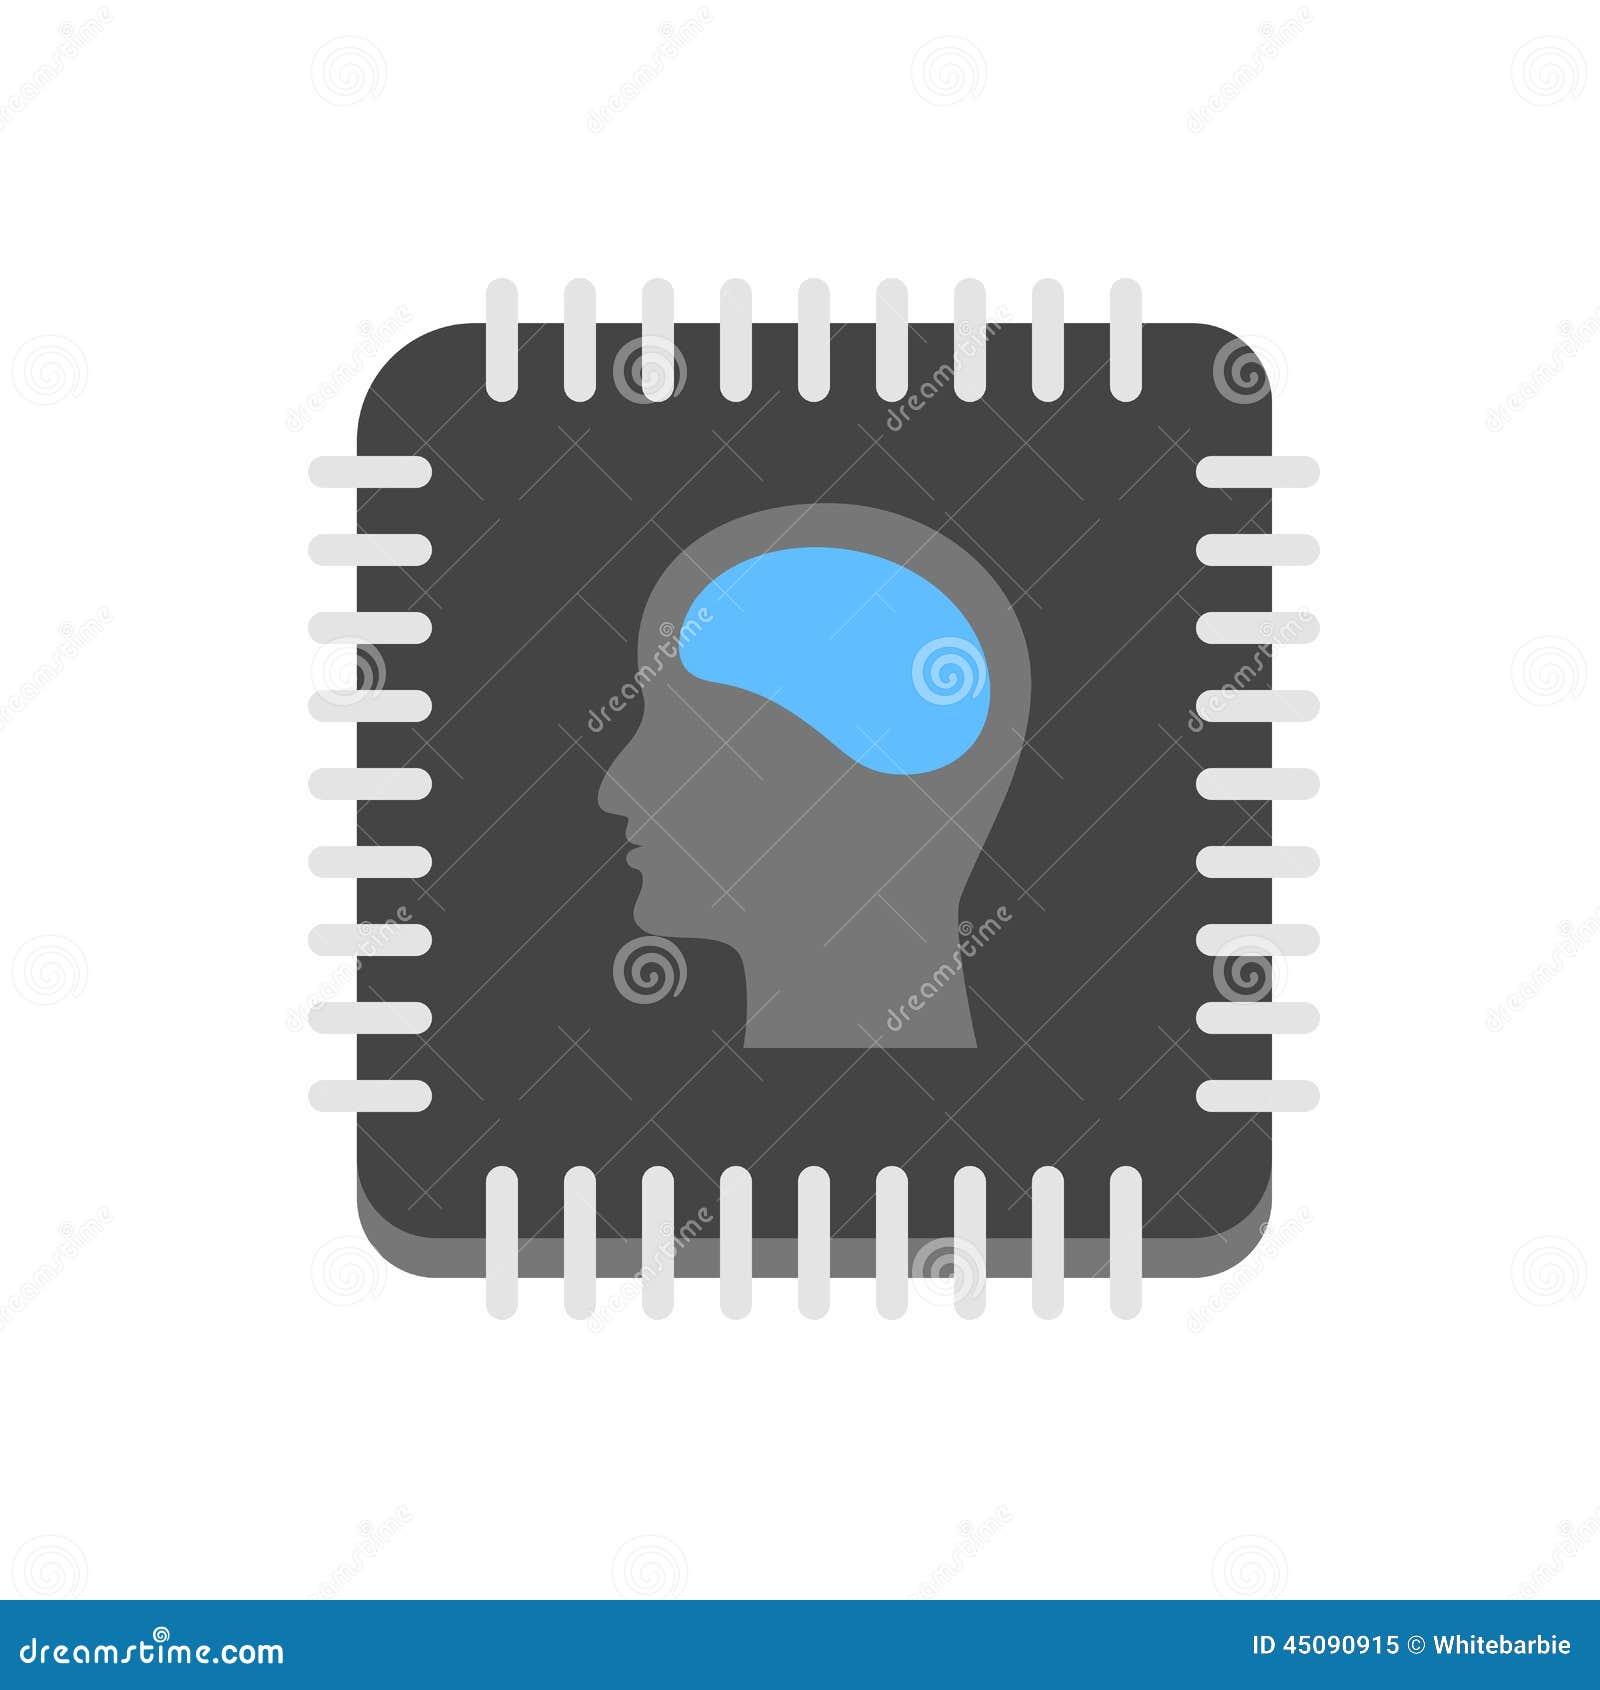 Artificial Intelligence Icon Stock Vector - Image: 45090915 Human Head Brain Vector